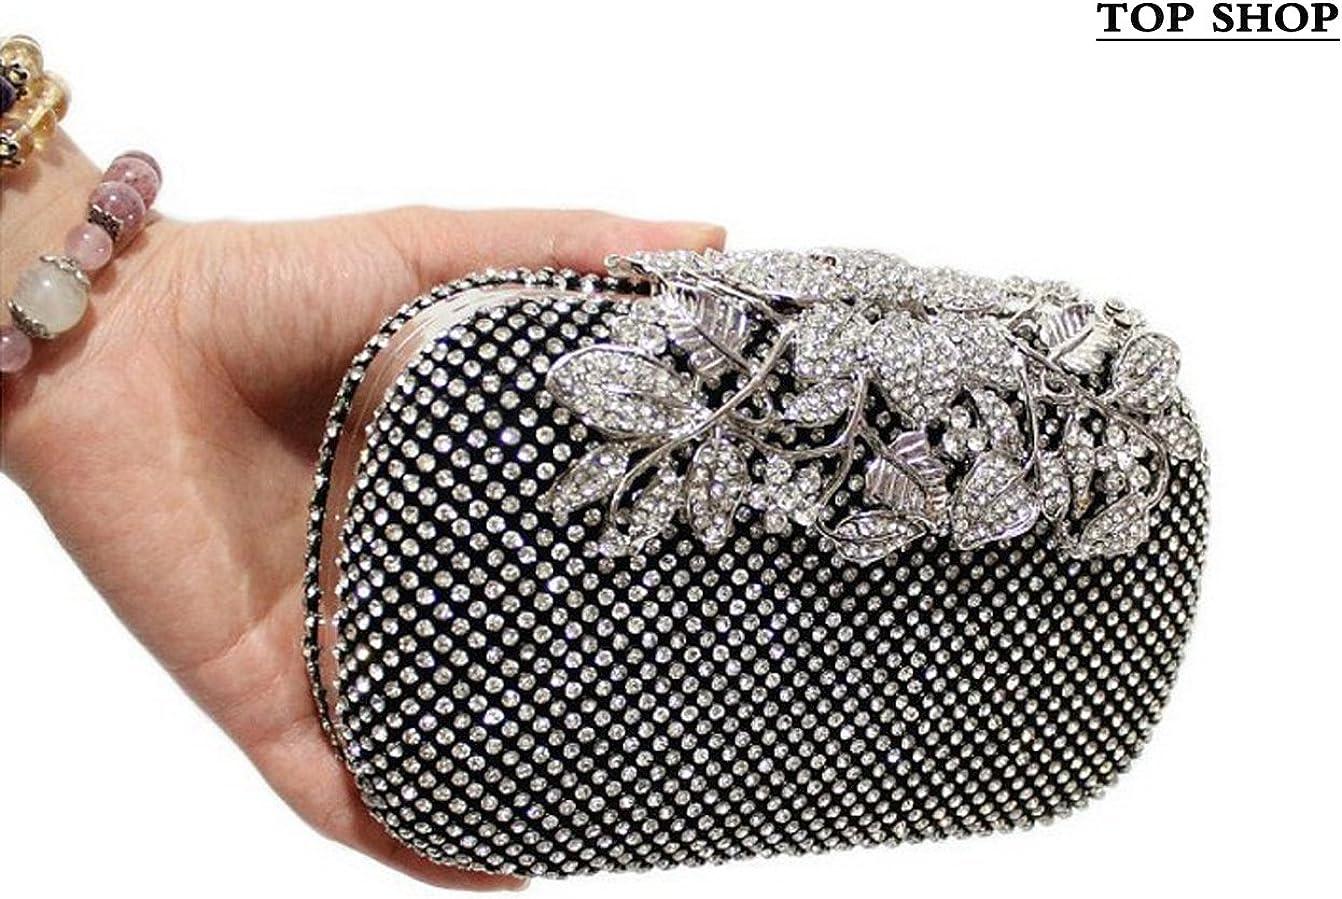 FTSUCQ Womens Flower Crystal Evening Bag Clutch Purse Shoulder Handbag Hobos